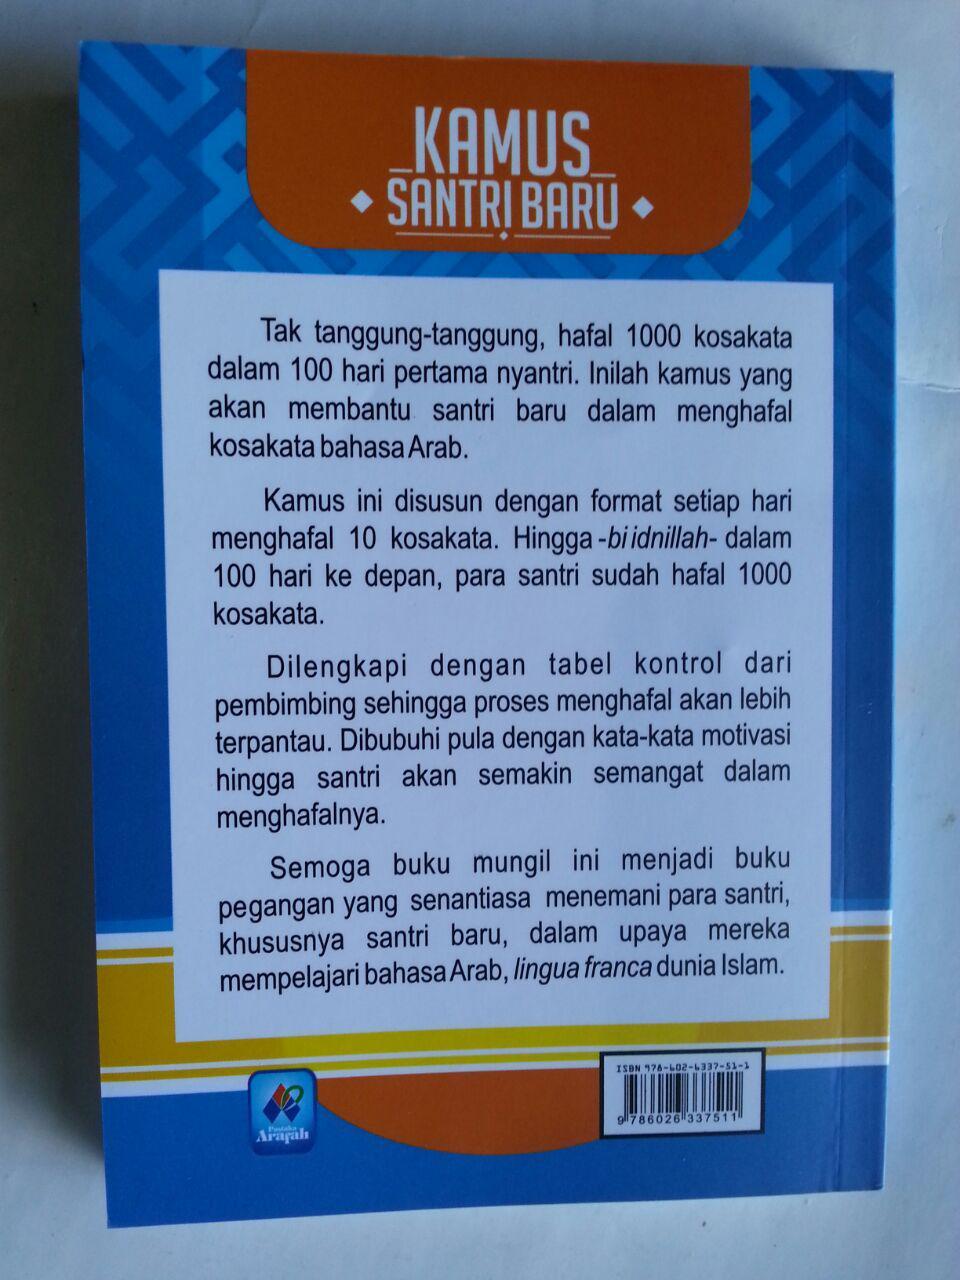 Buku Kamus Santri Baru Arab Indonesia 1 Set 3 Jilid cover 5